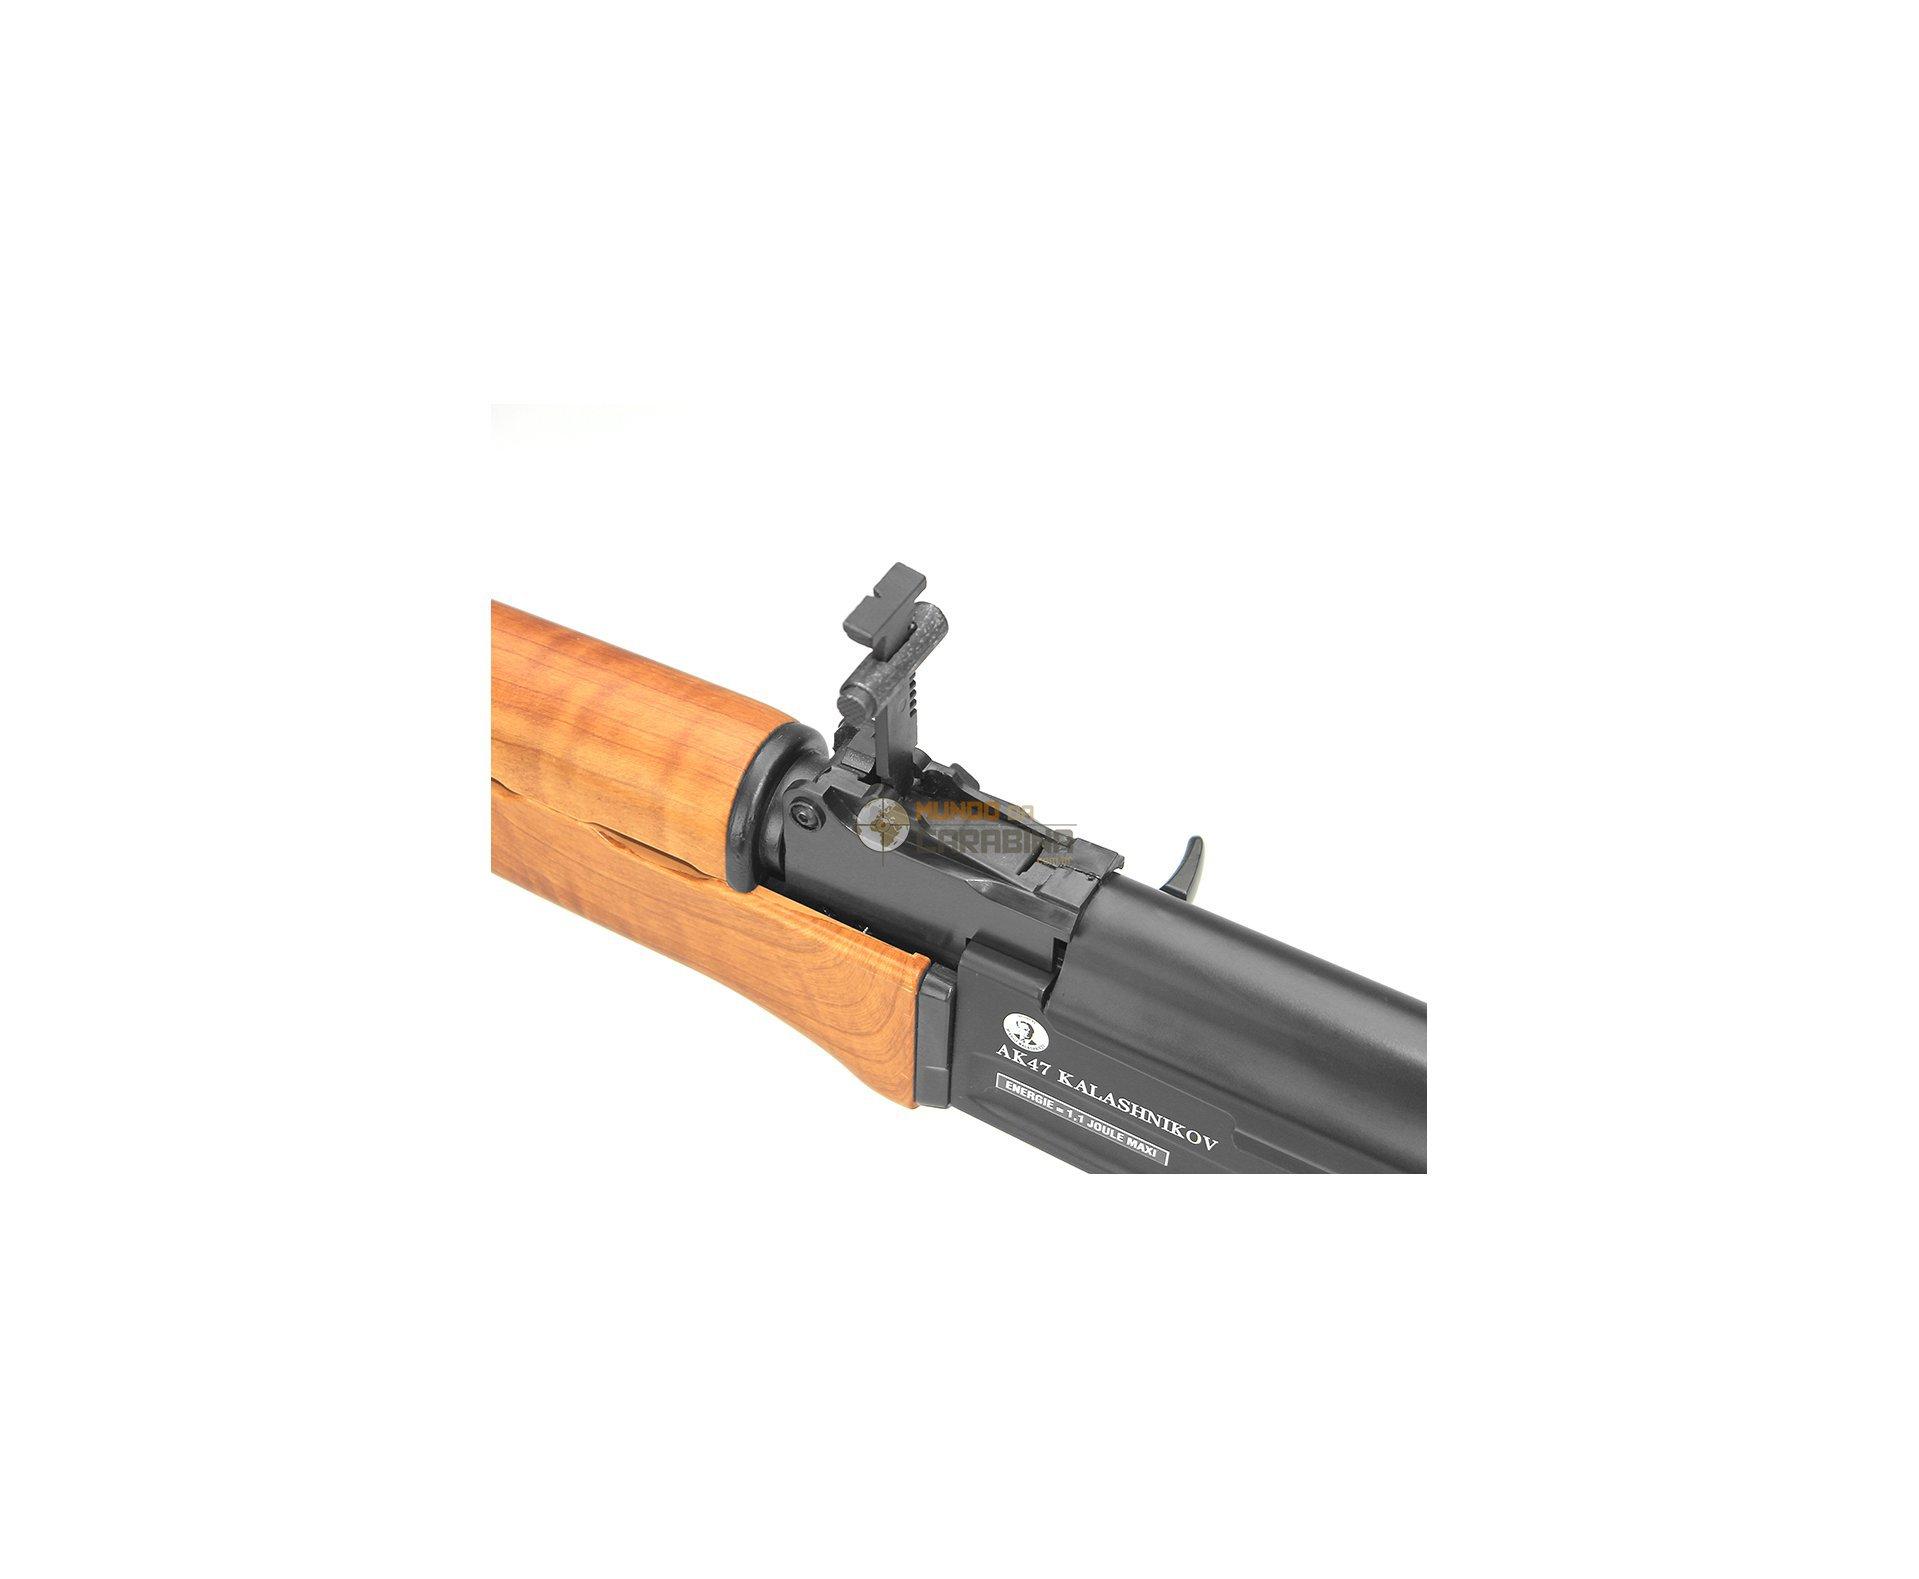 Rifle De Aisoft Kalashnikov Ak 47 - Full Metal - Calibre 6,0 Mm - Cyber Gun - 220 V